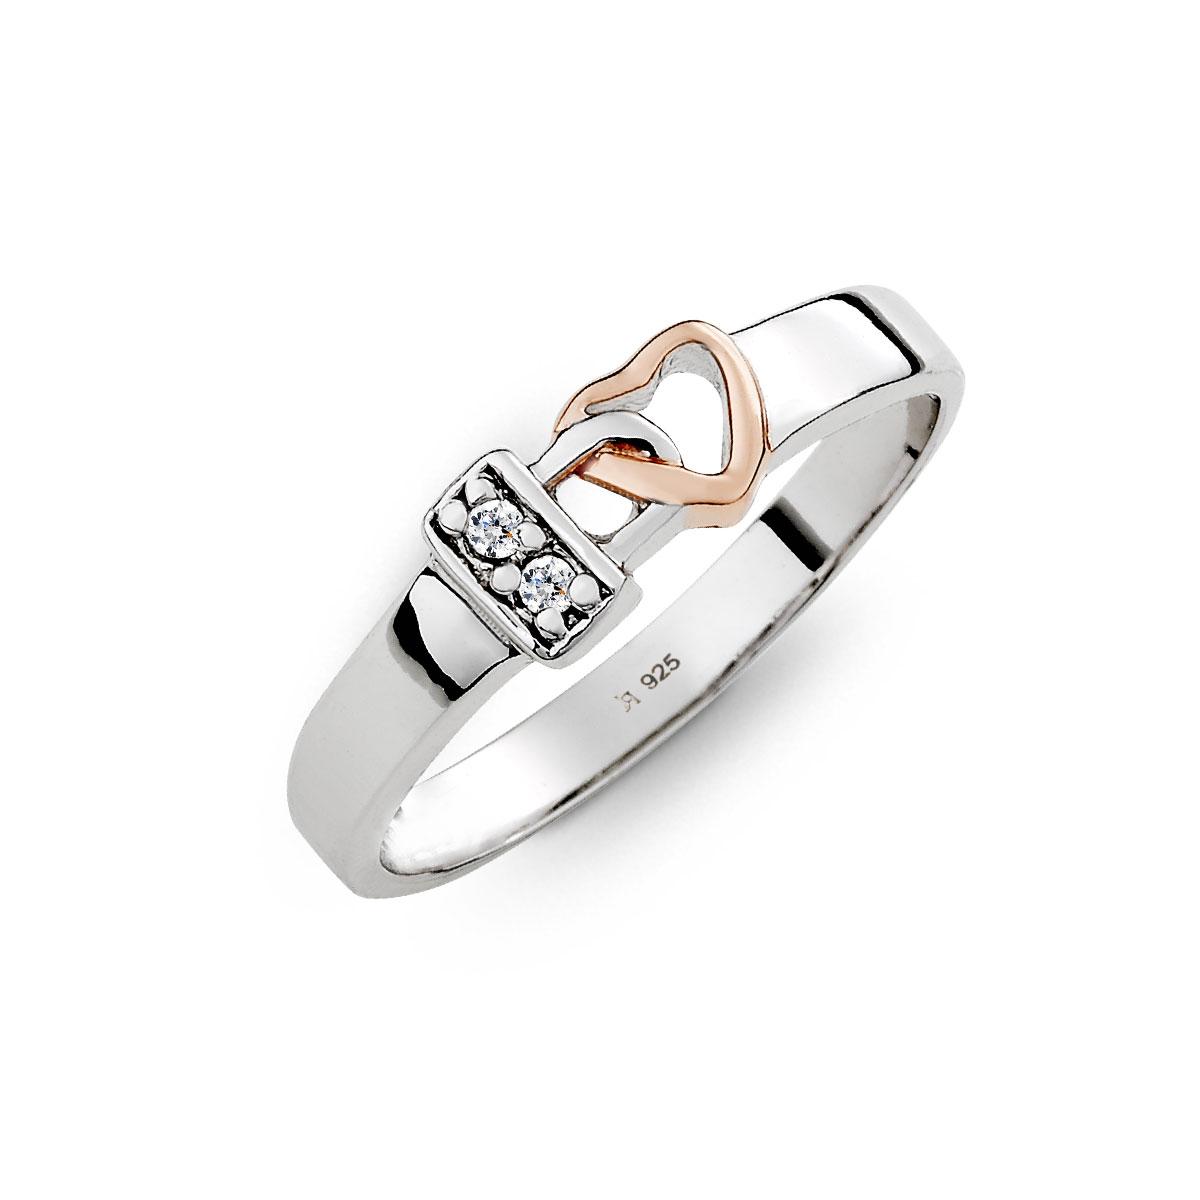 KSW286 把你的心上鎖戒指